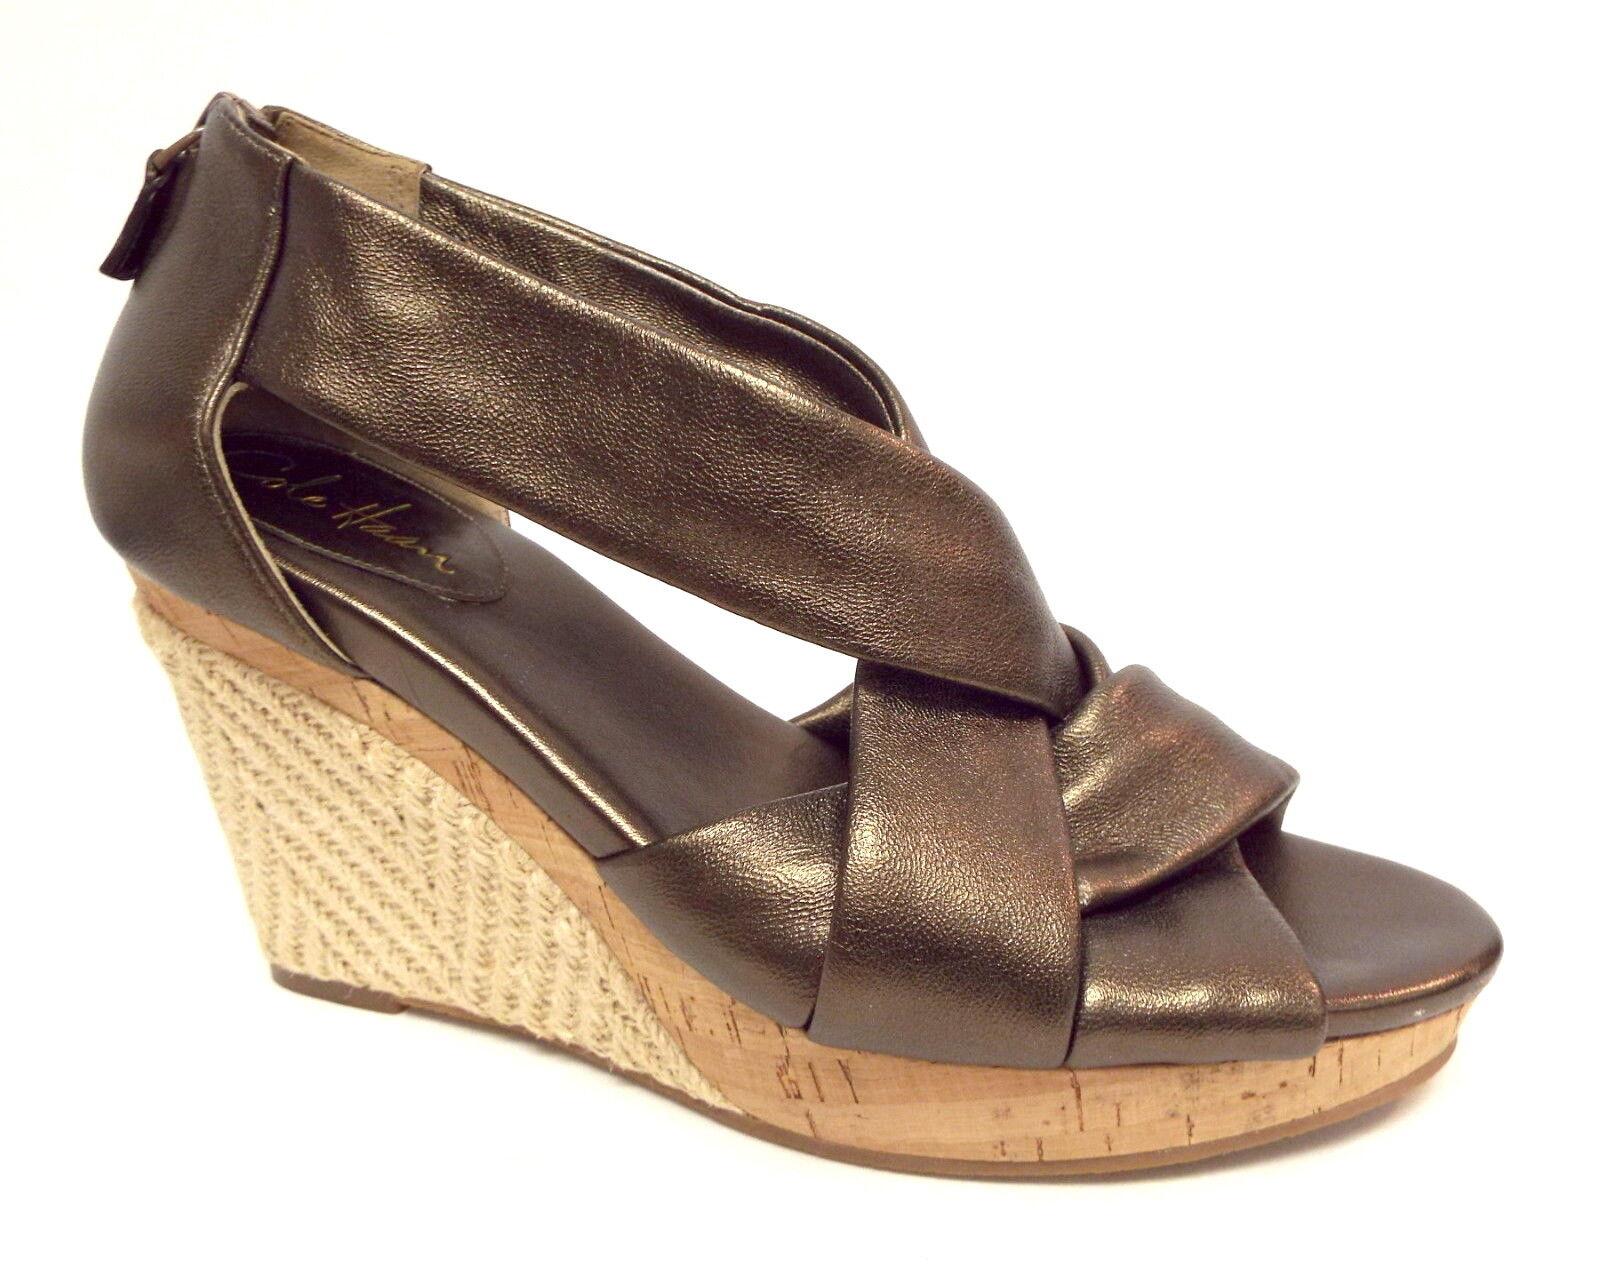 COLE HAAN Size 8 Bronze Delfina Espadrille Wedges Sandals shoes w  N. Air